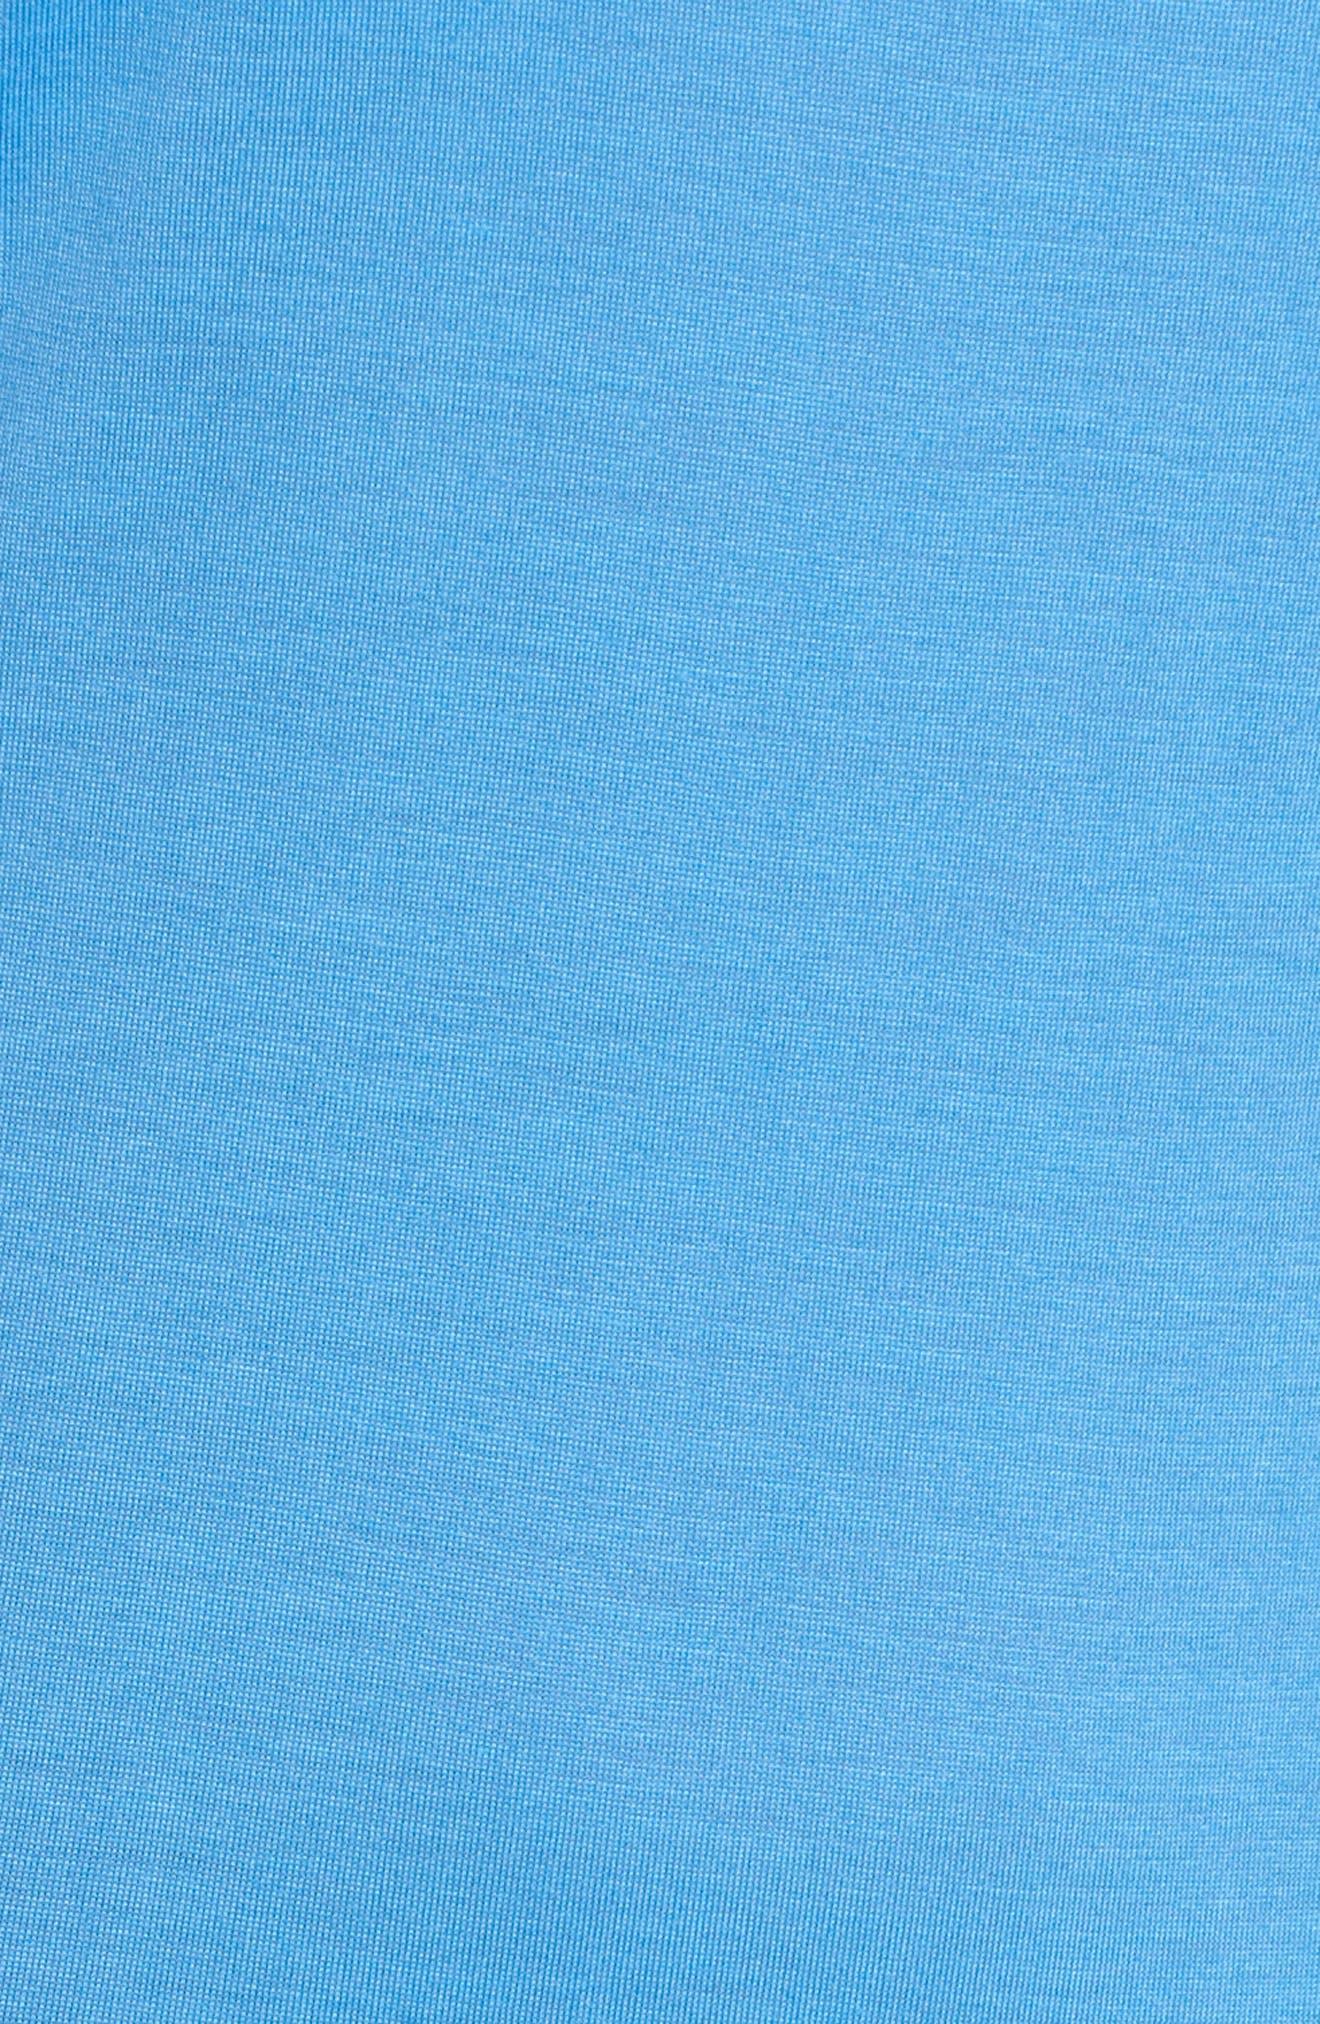 Racerback Cover-Up Tank Dress,                             Alternate thumbnail 5, color,                             BLUE LAPIS